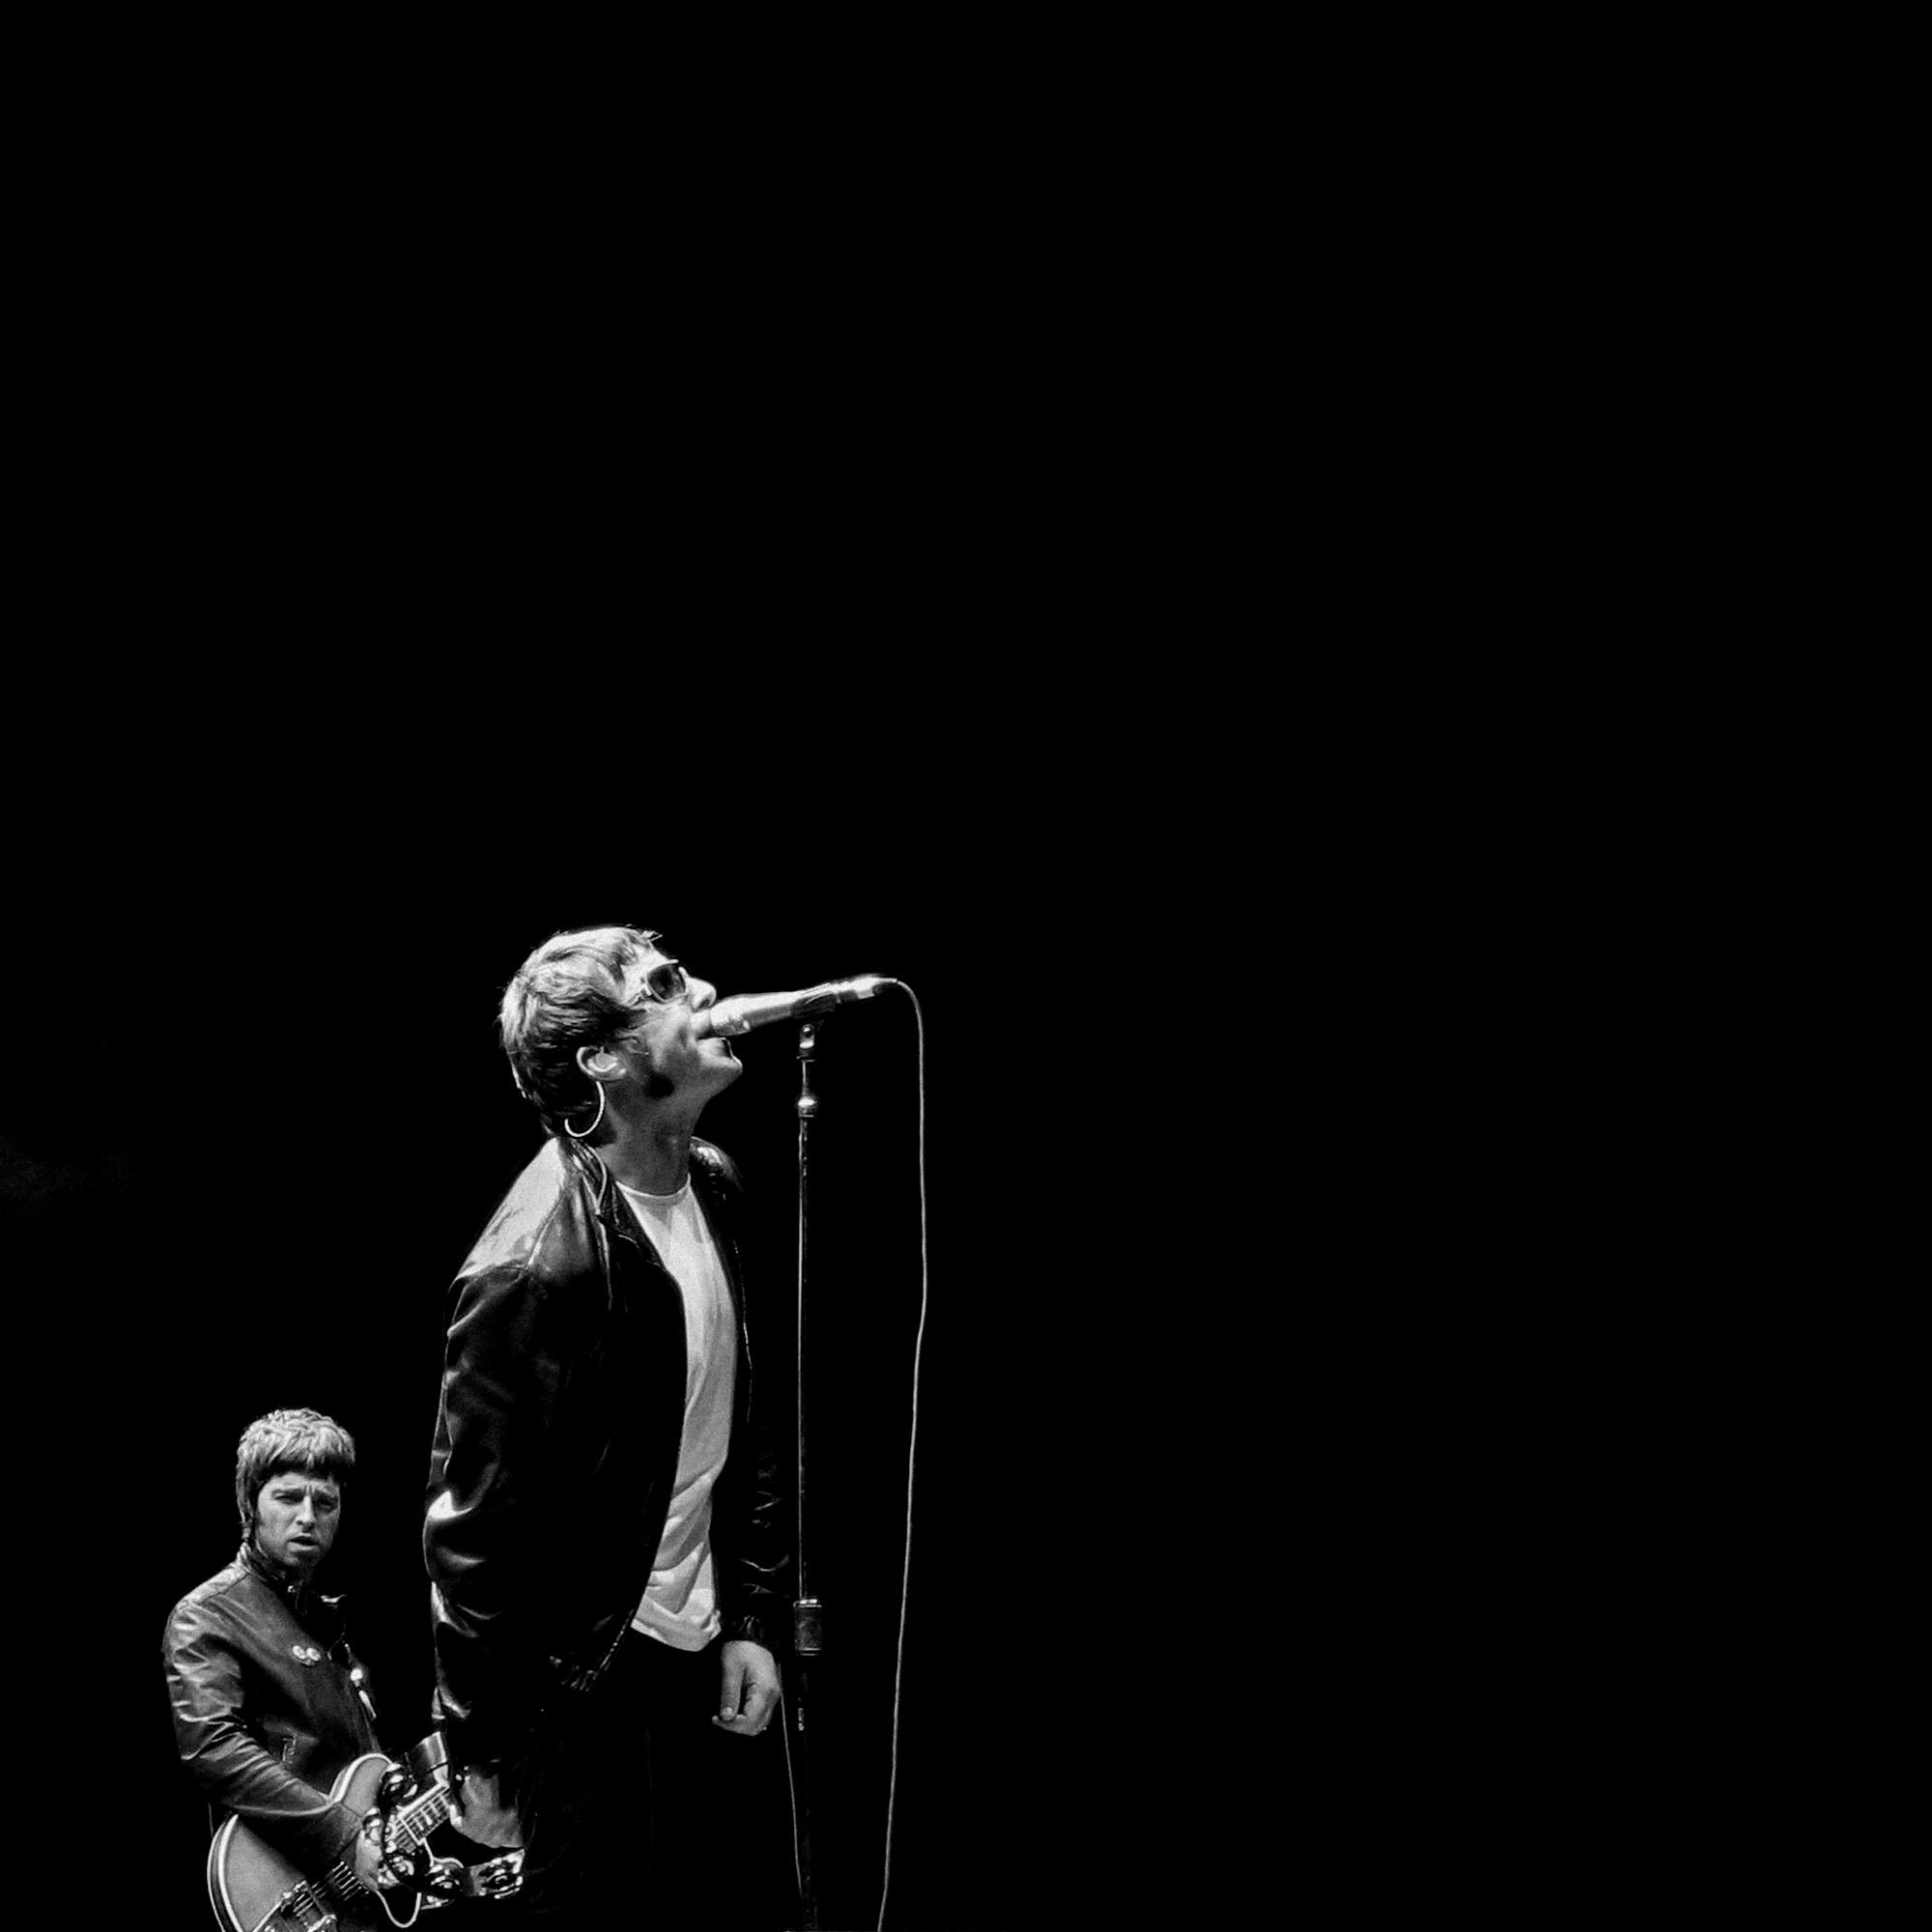 Lisa-Mark-Toronto-Music-Photographer-75-Oasis-2005.jpg